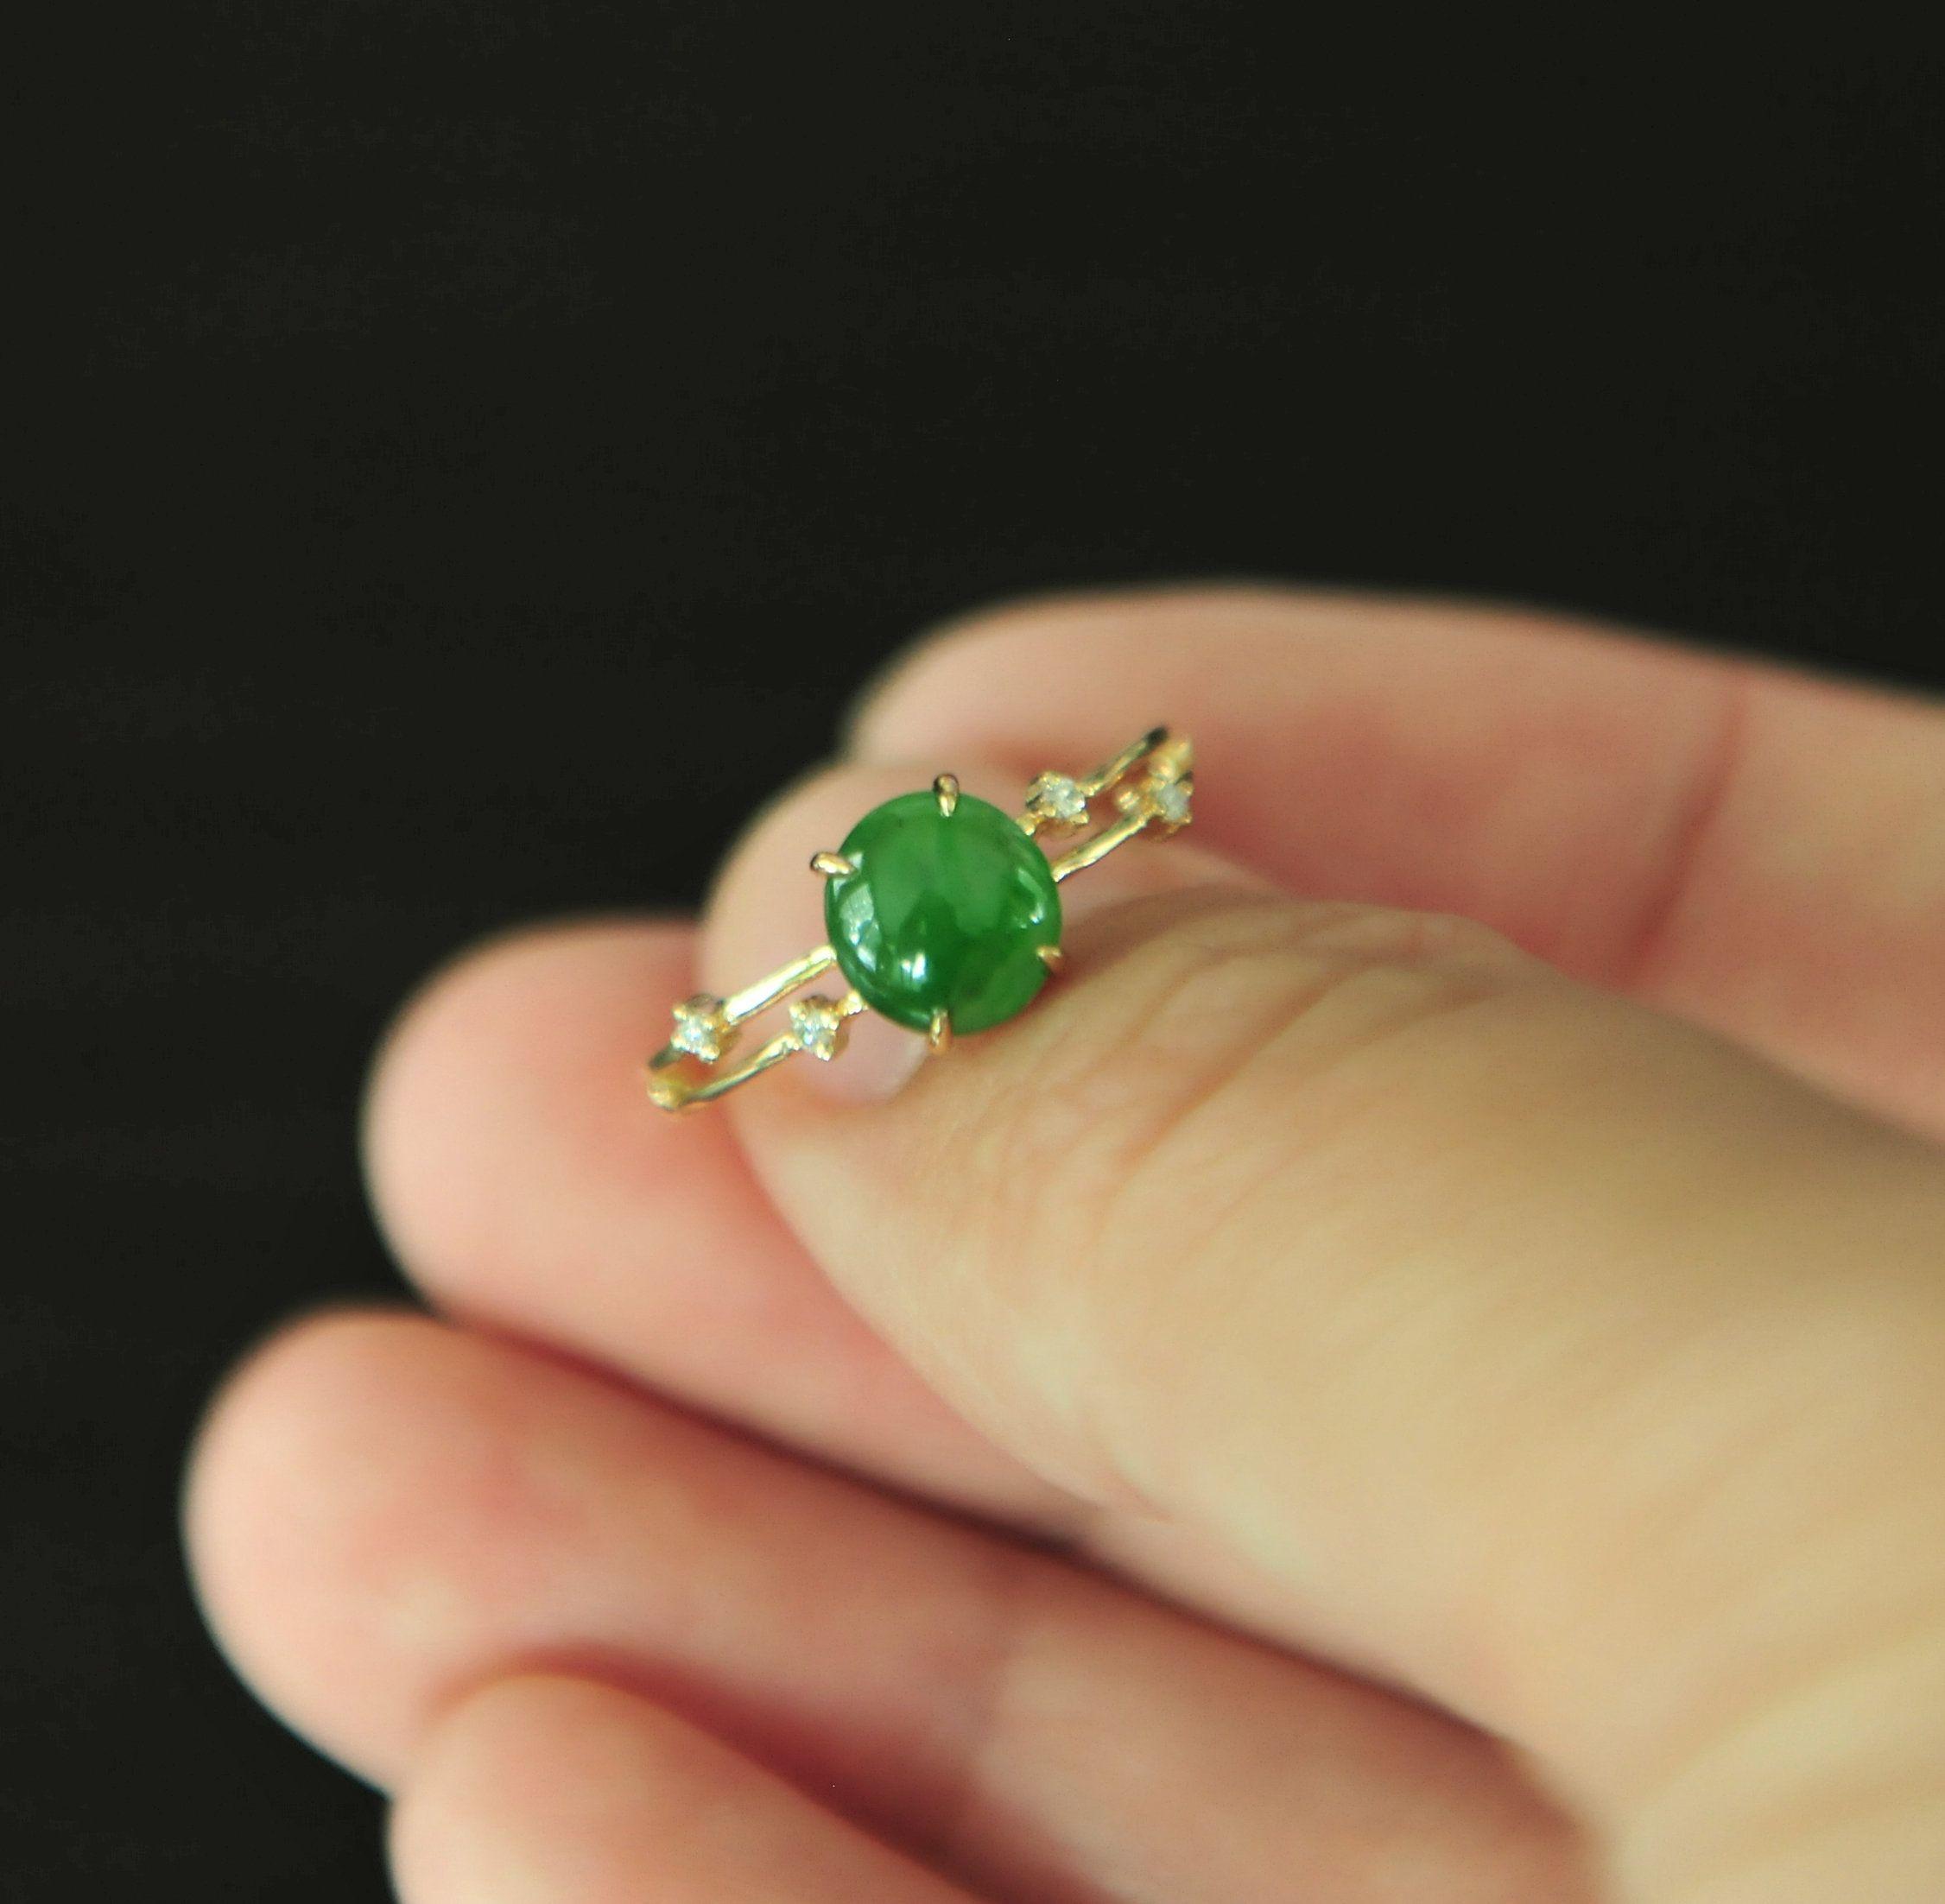 Green ring Engagement Ring Minimalist Ring Natural Silver Jade Ring Jade ring size 9 Anniversary Ring Jade Ring For Women,Ring Gem